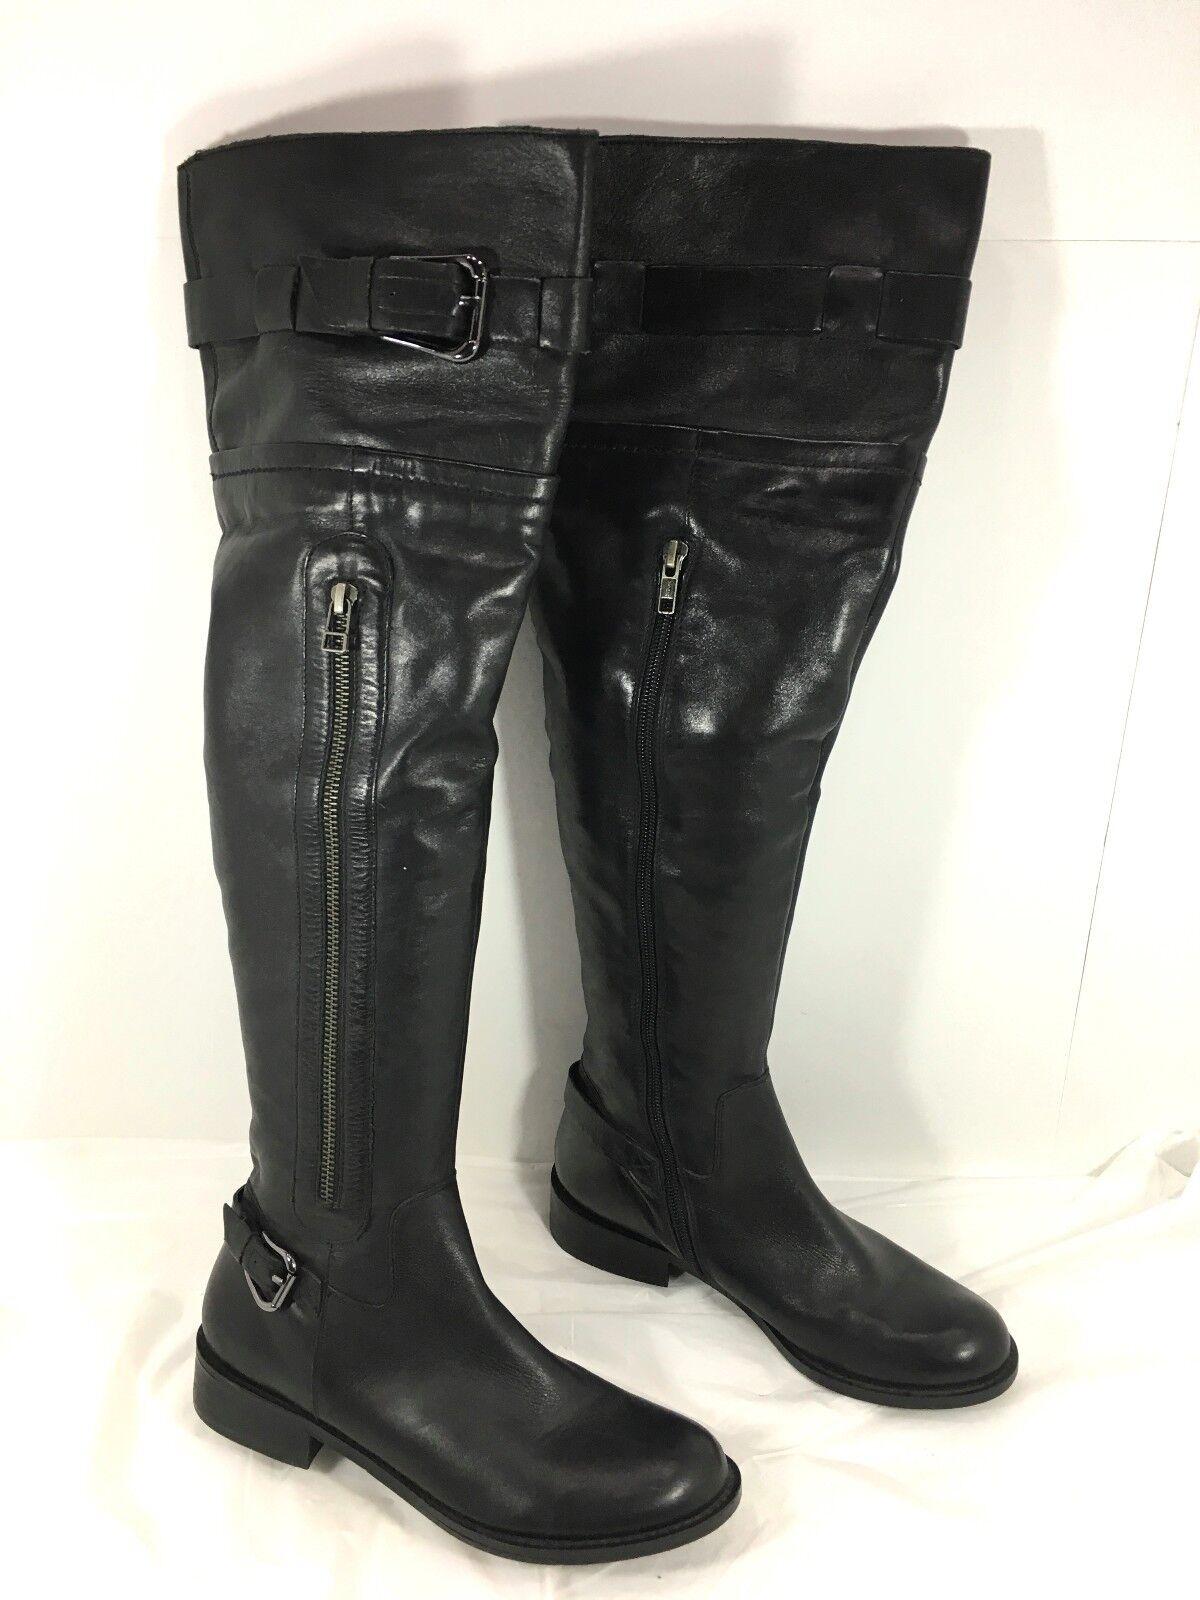 miglior prezzo Steven Steve Madden Sabra Sabra Sabra Belted & Zippers Over the Knee High stivali nero Sz 6  godendo i tuoi acquisti